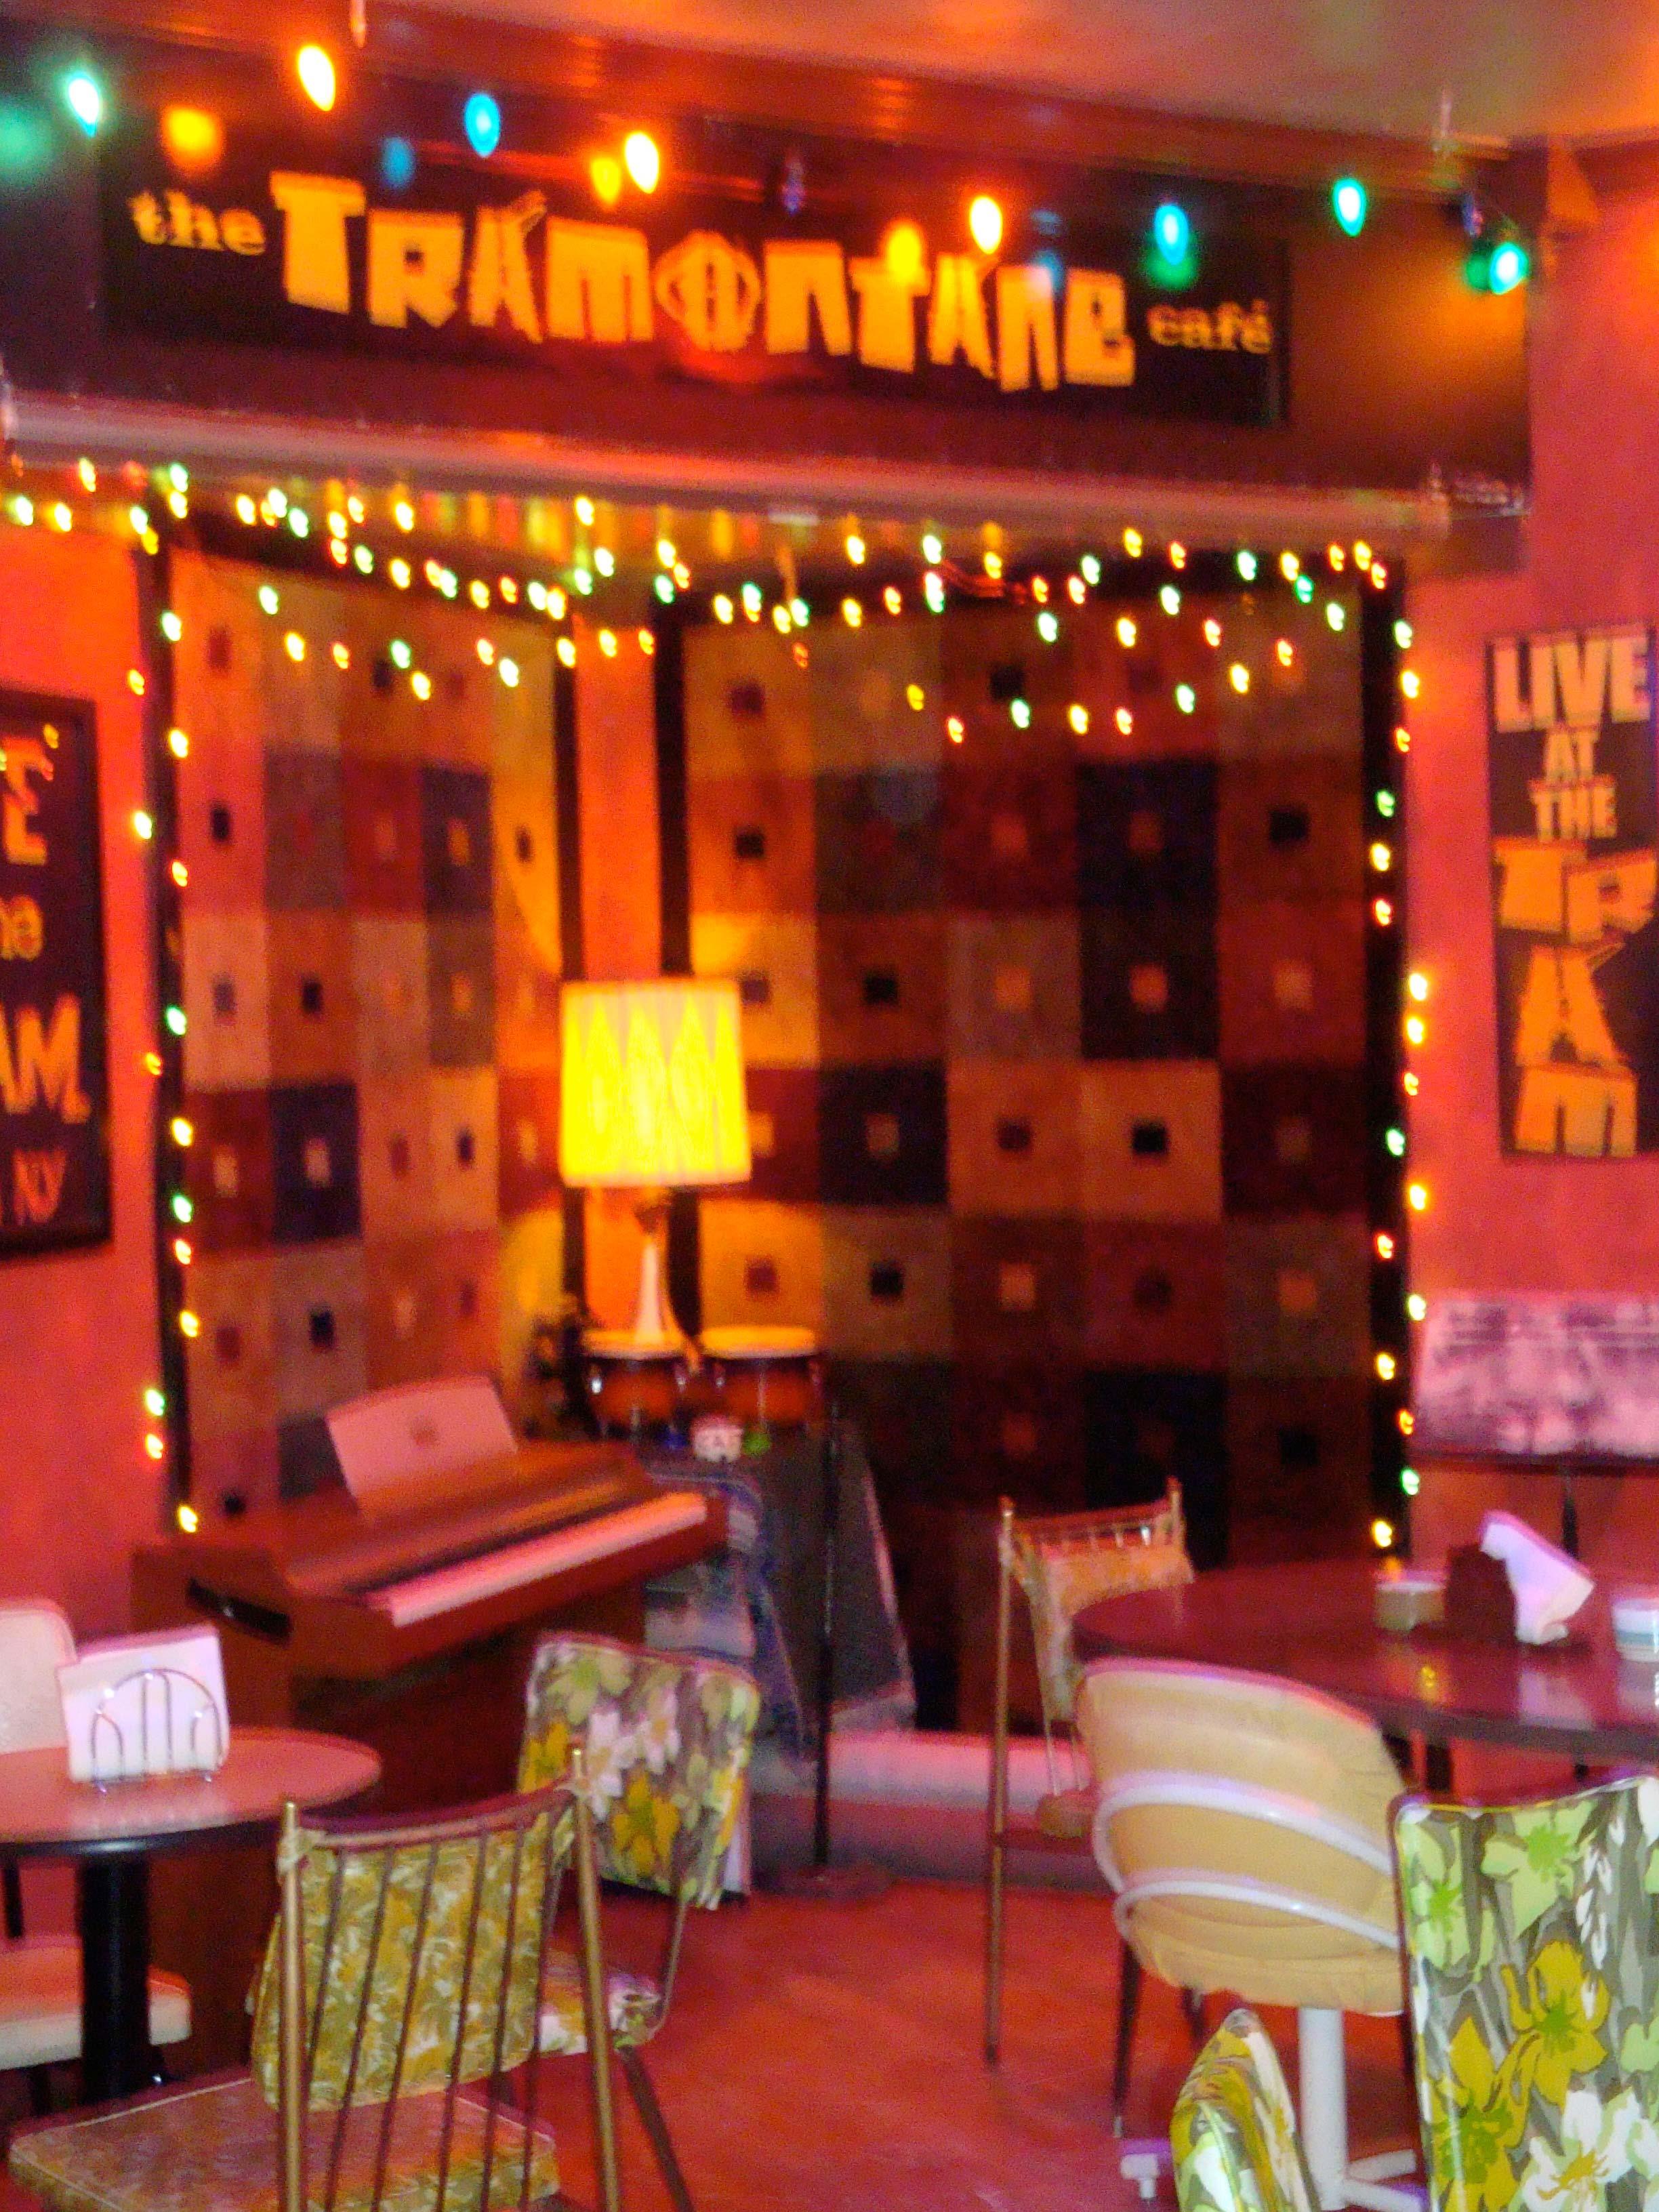 Tramontane Cafe Menu